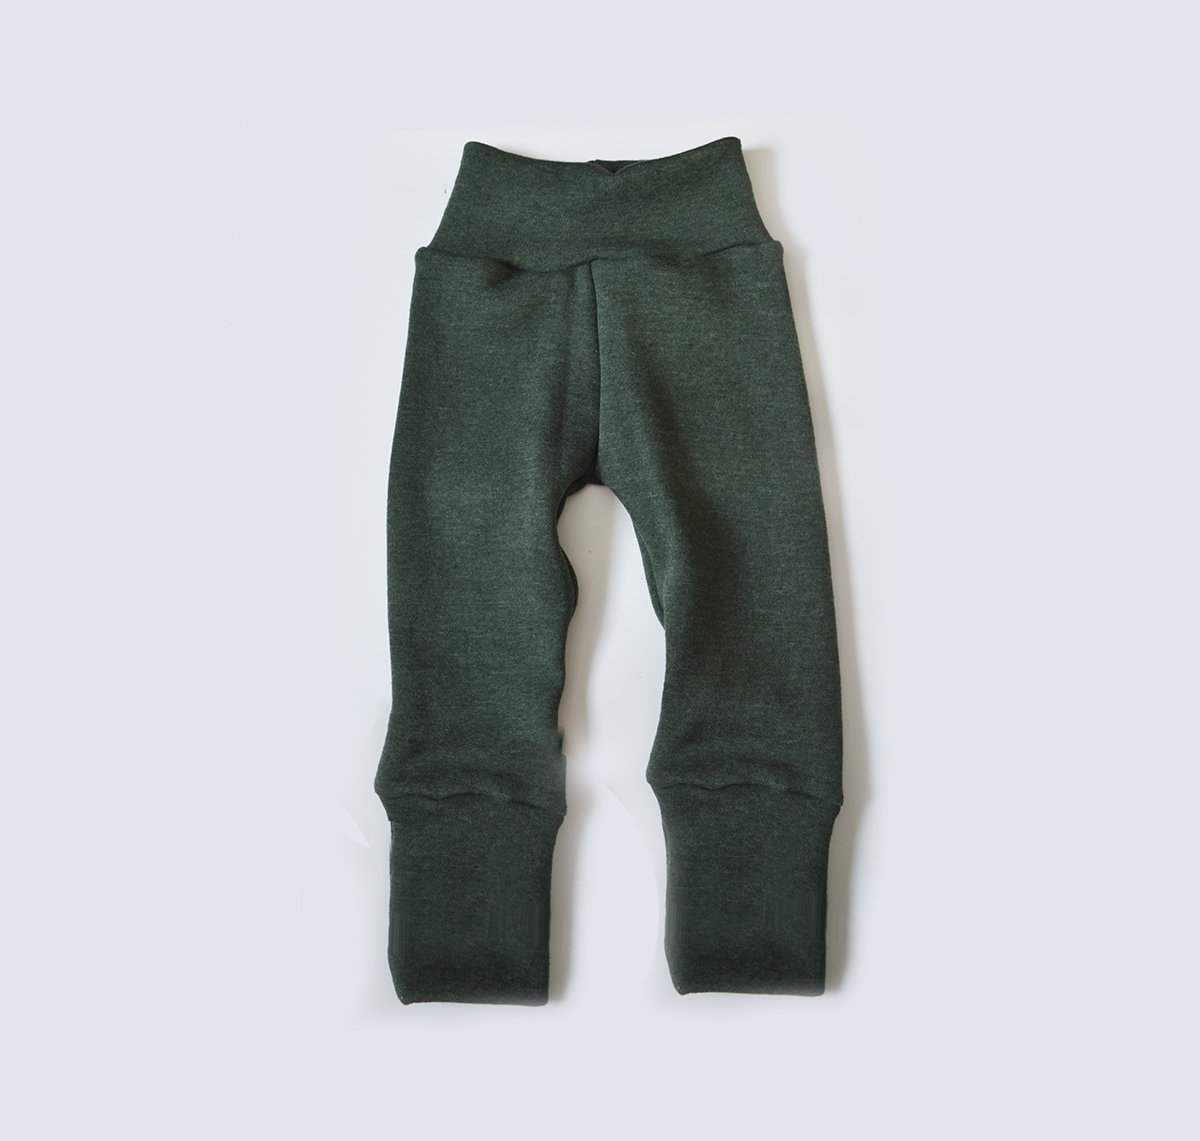 Little Sprout Pants™ Green Stretchy Sweatshirt Fleece 00456